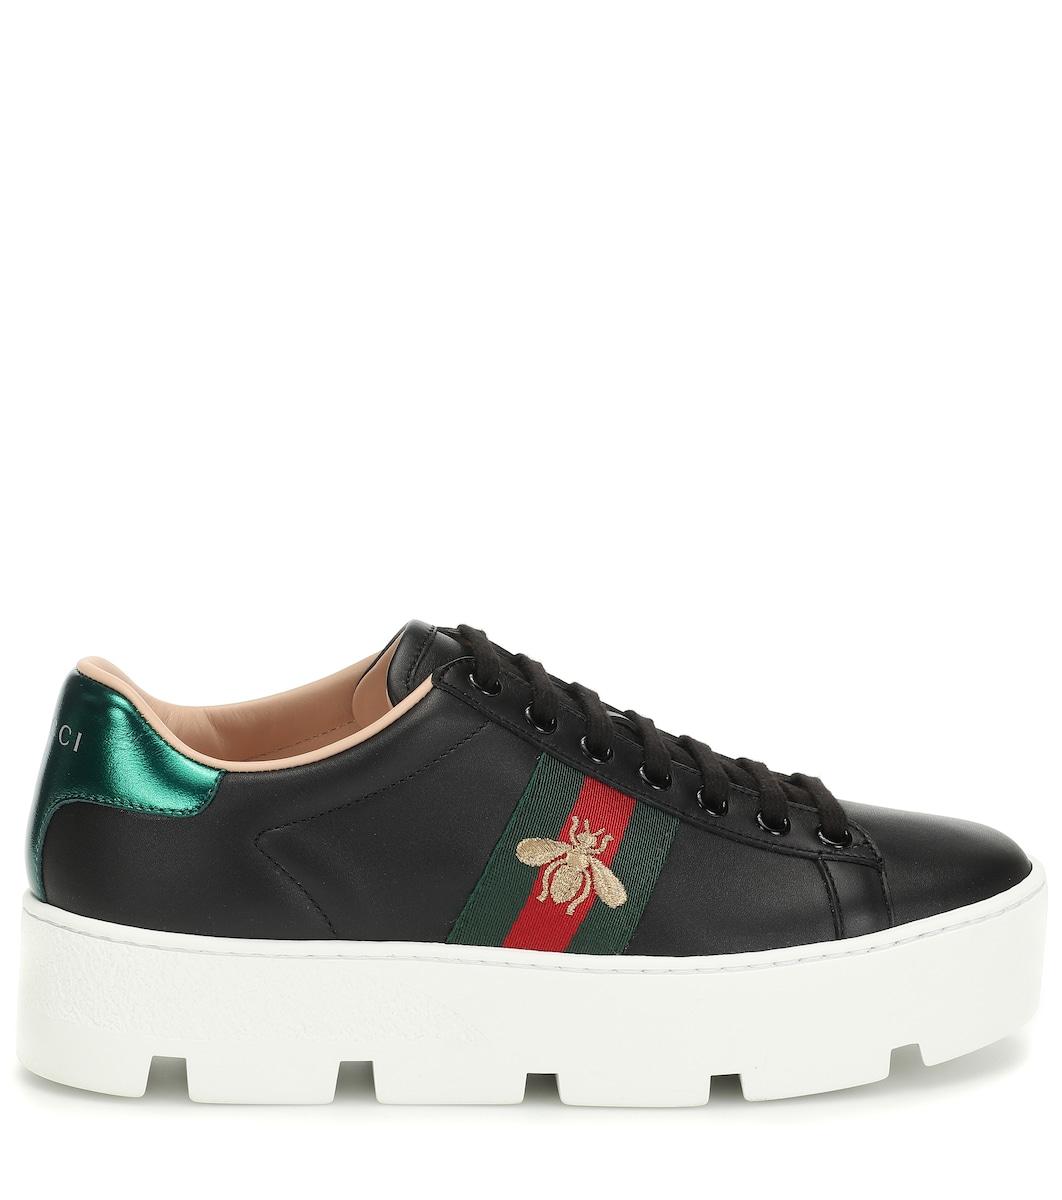 082b5ebe8 Gucci - Ace leather platform sneakers | Mytheresa